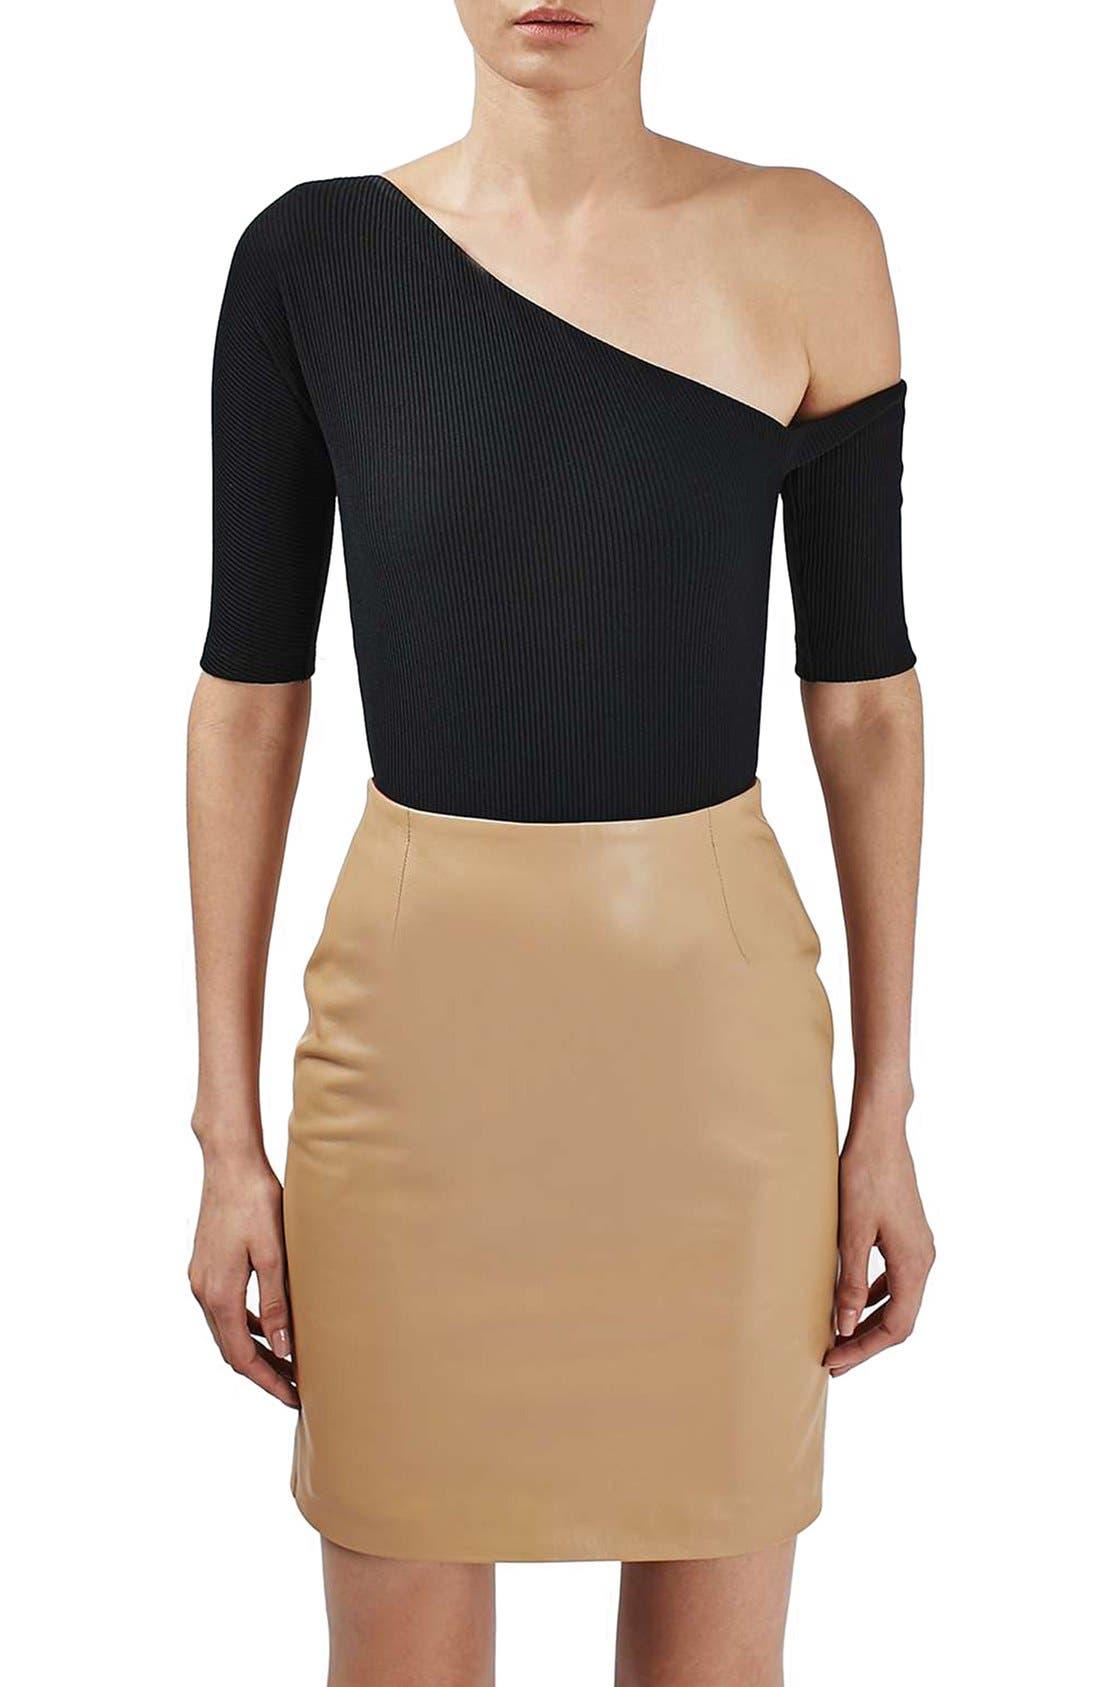 Alternate Image 1 Selected - Topshop Boutique Asymmetrical Bodysuit